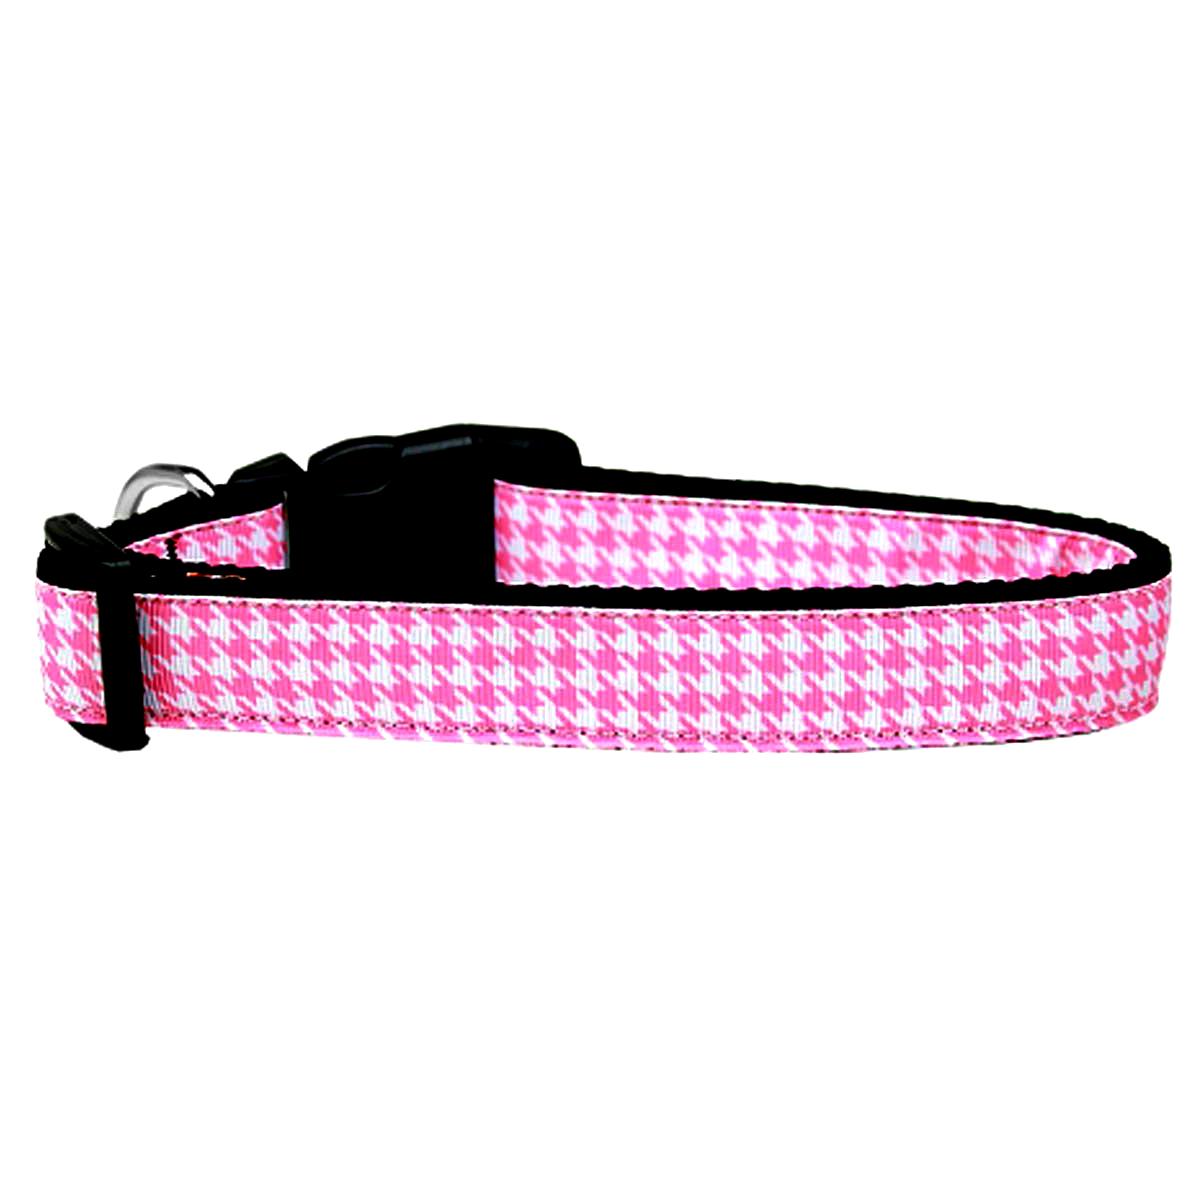 Houndstooth Nylon Dog Collar - Pink